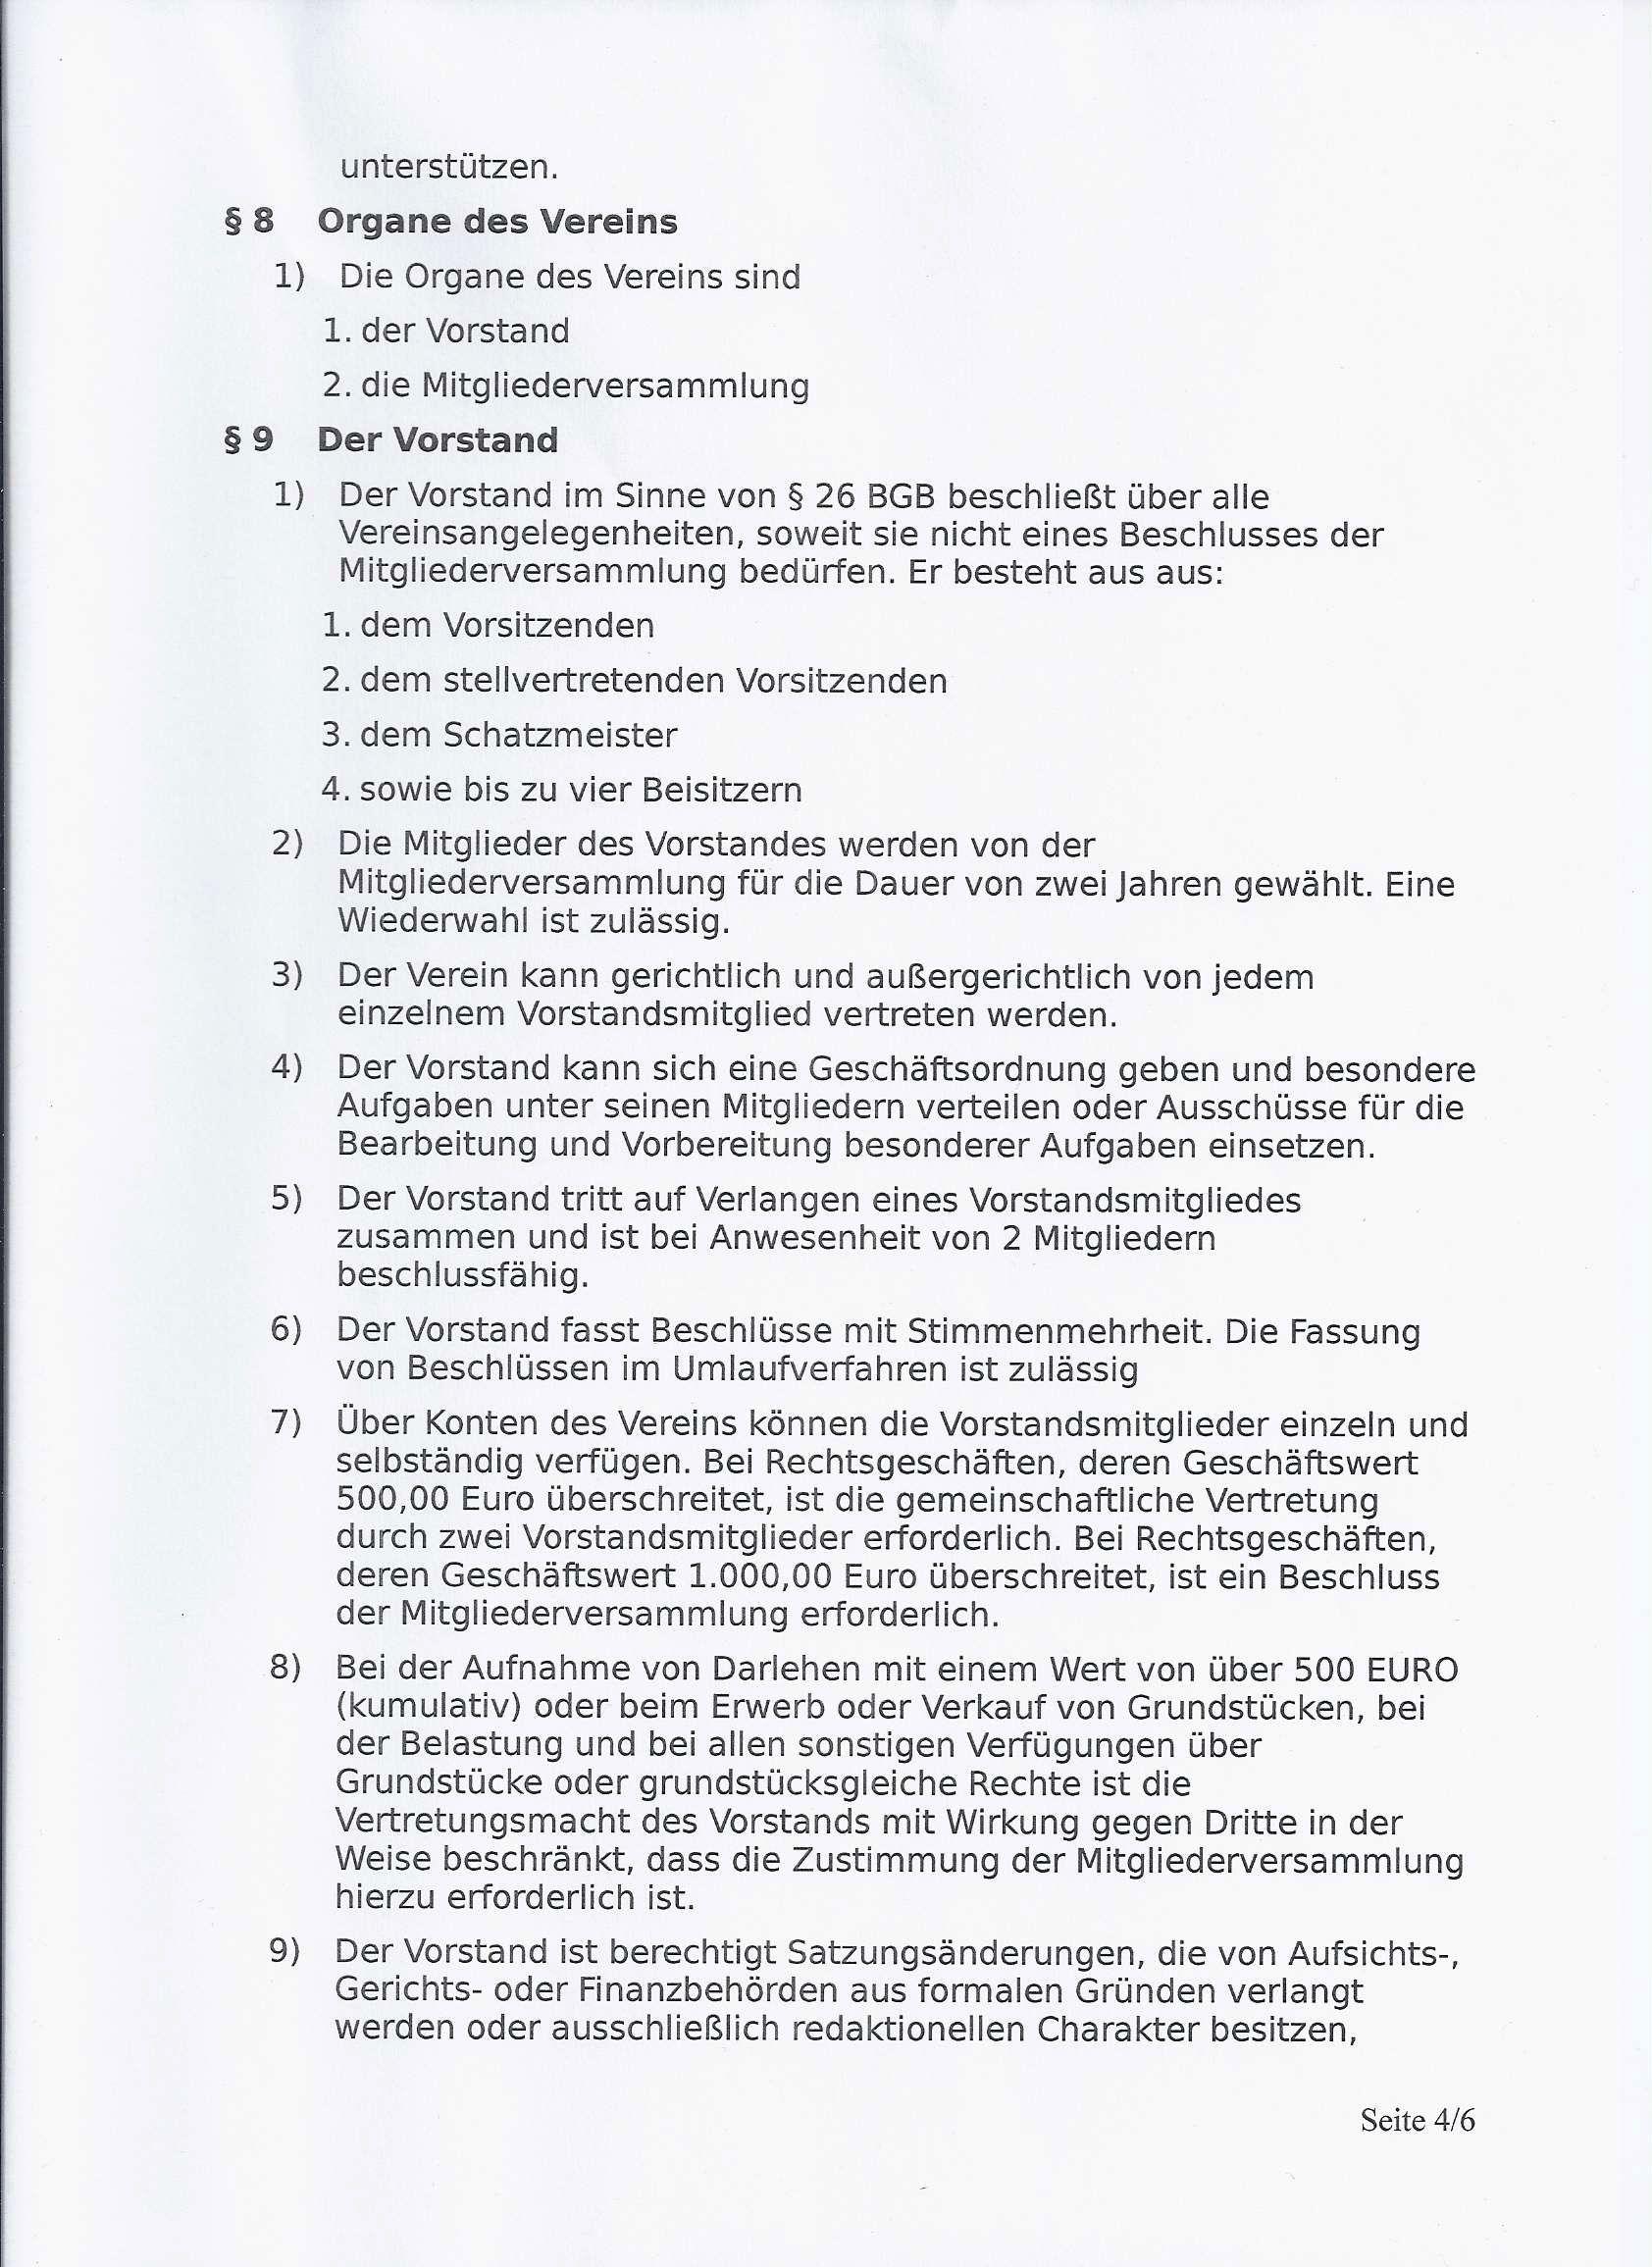 Satzung/Gründungssatzung/verein_freifunk_oldenburg_satzung_0004.jpg